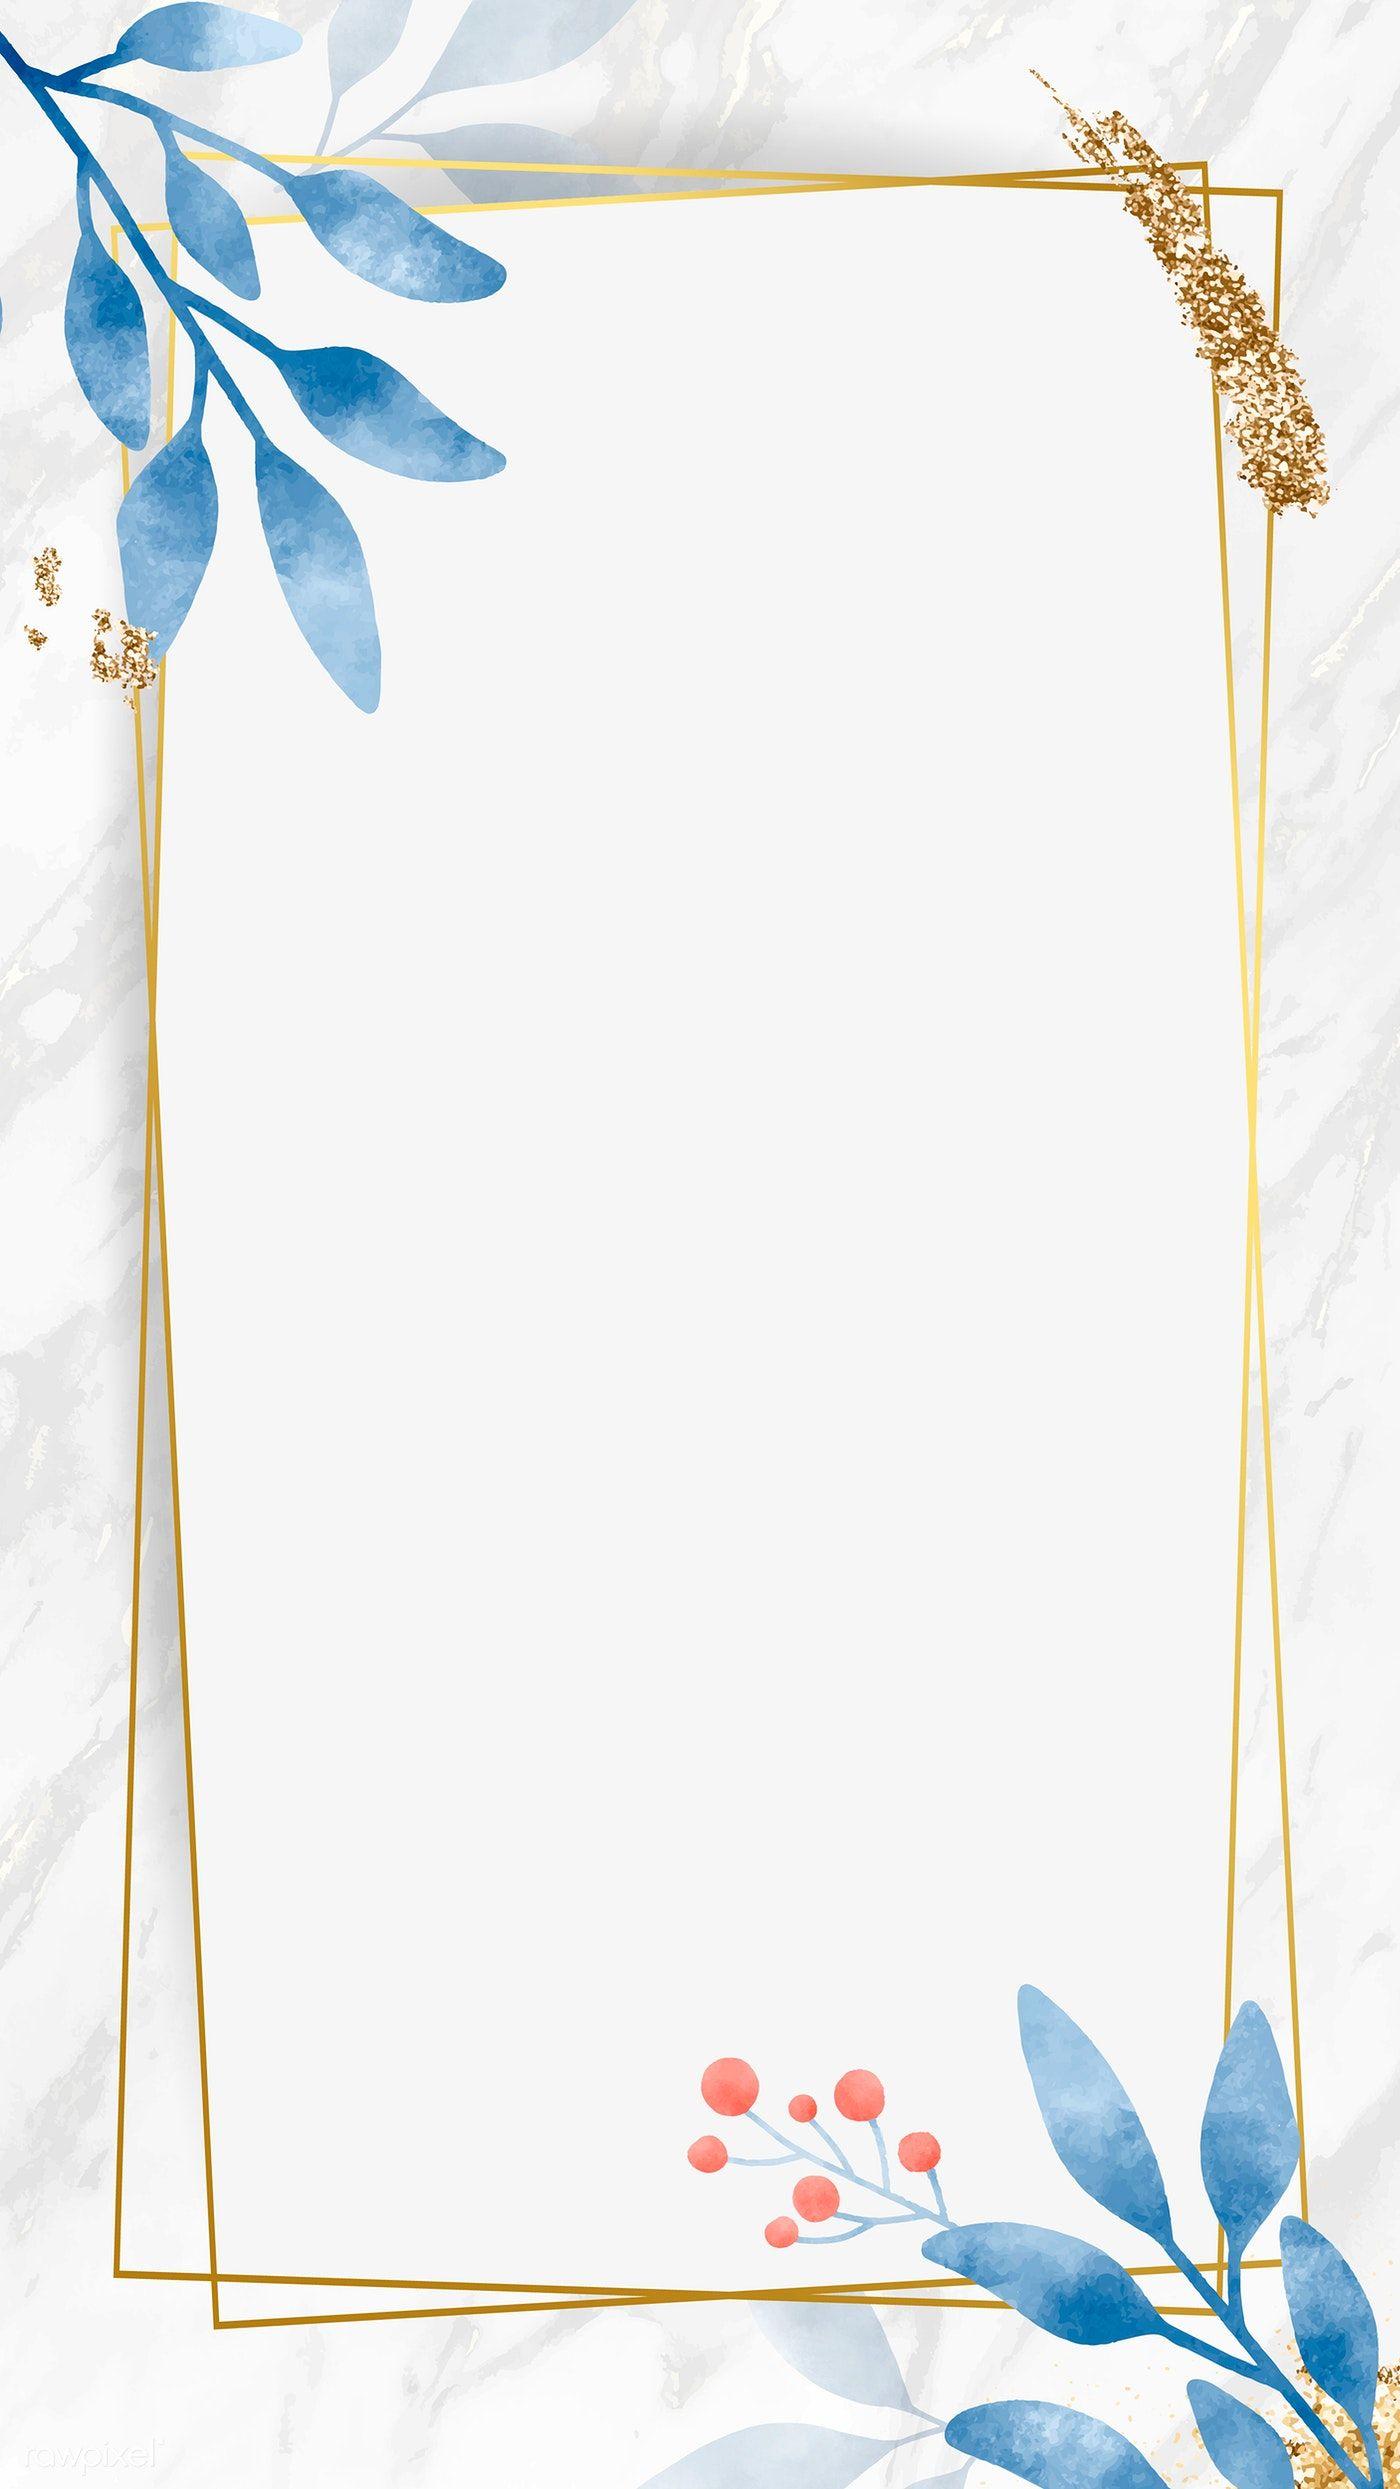 Download Premium Vector Of Watercolor Leafy Frame Mobile Phone Wallpaper Floral Border Design Flower Background Wallpaper Floral Frame Vector